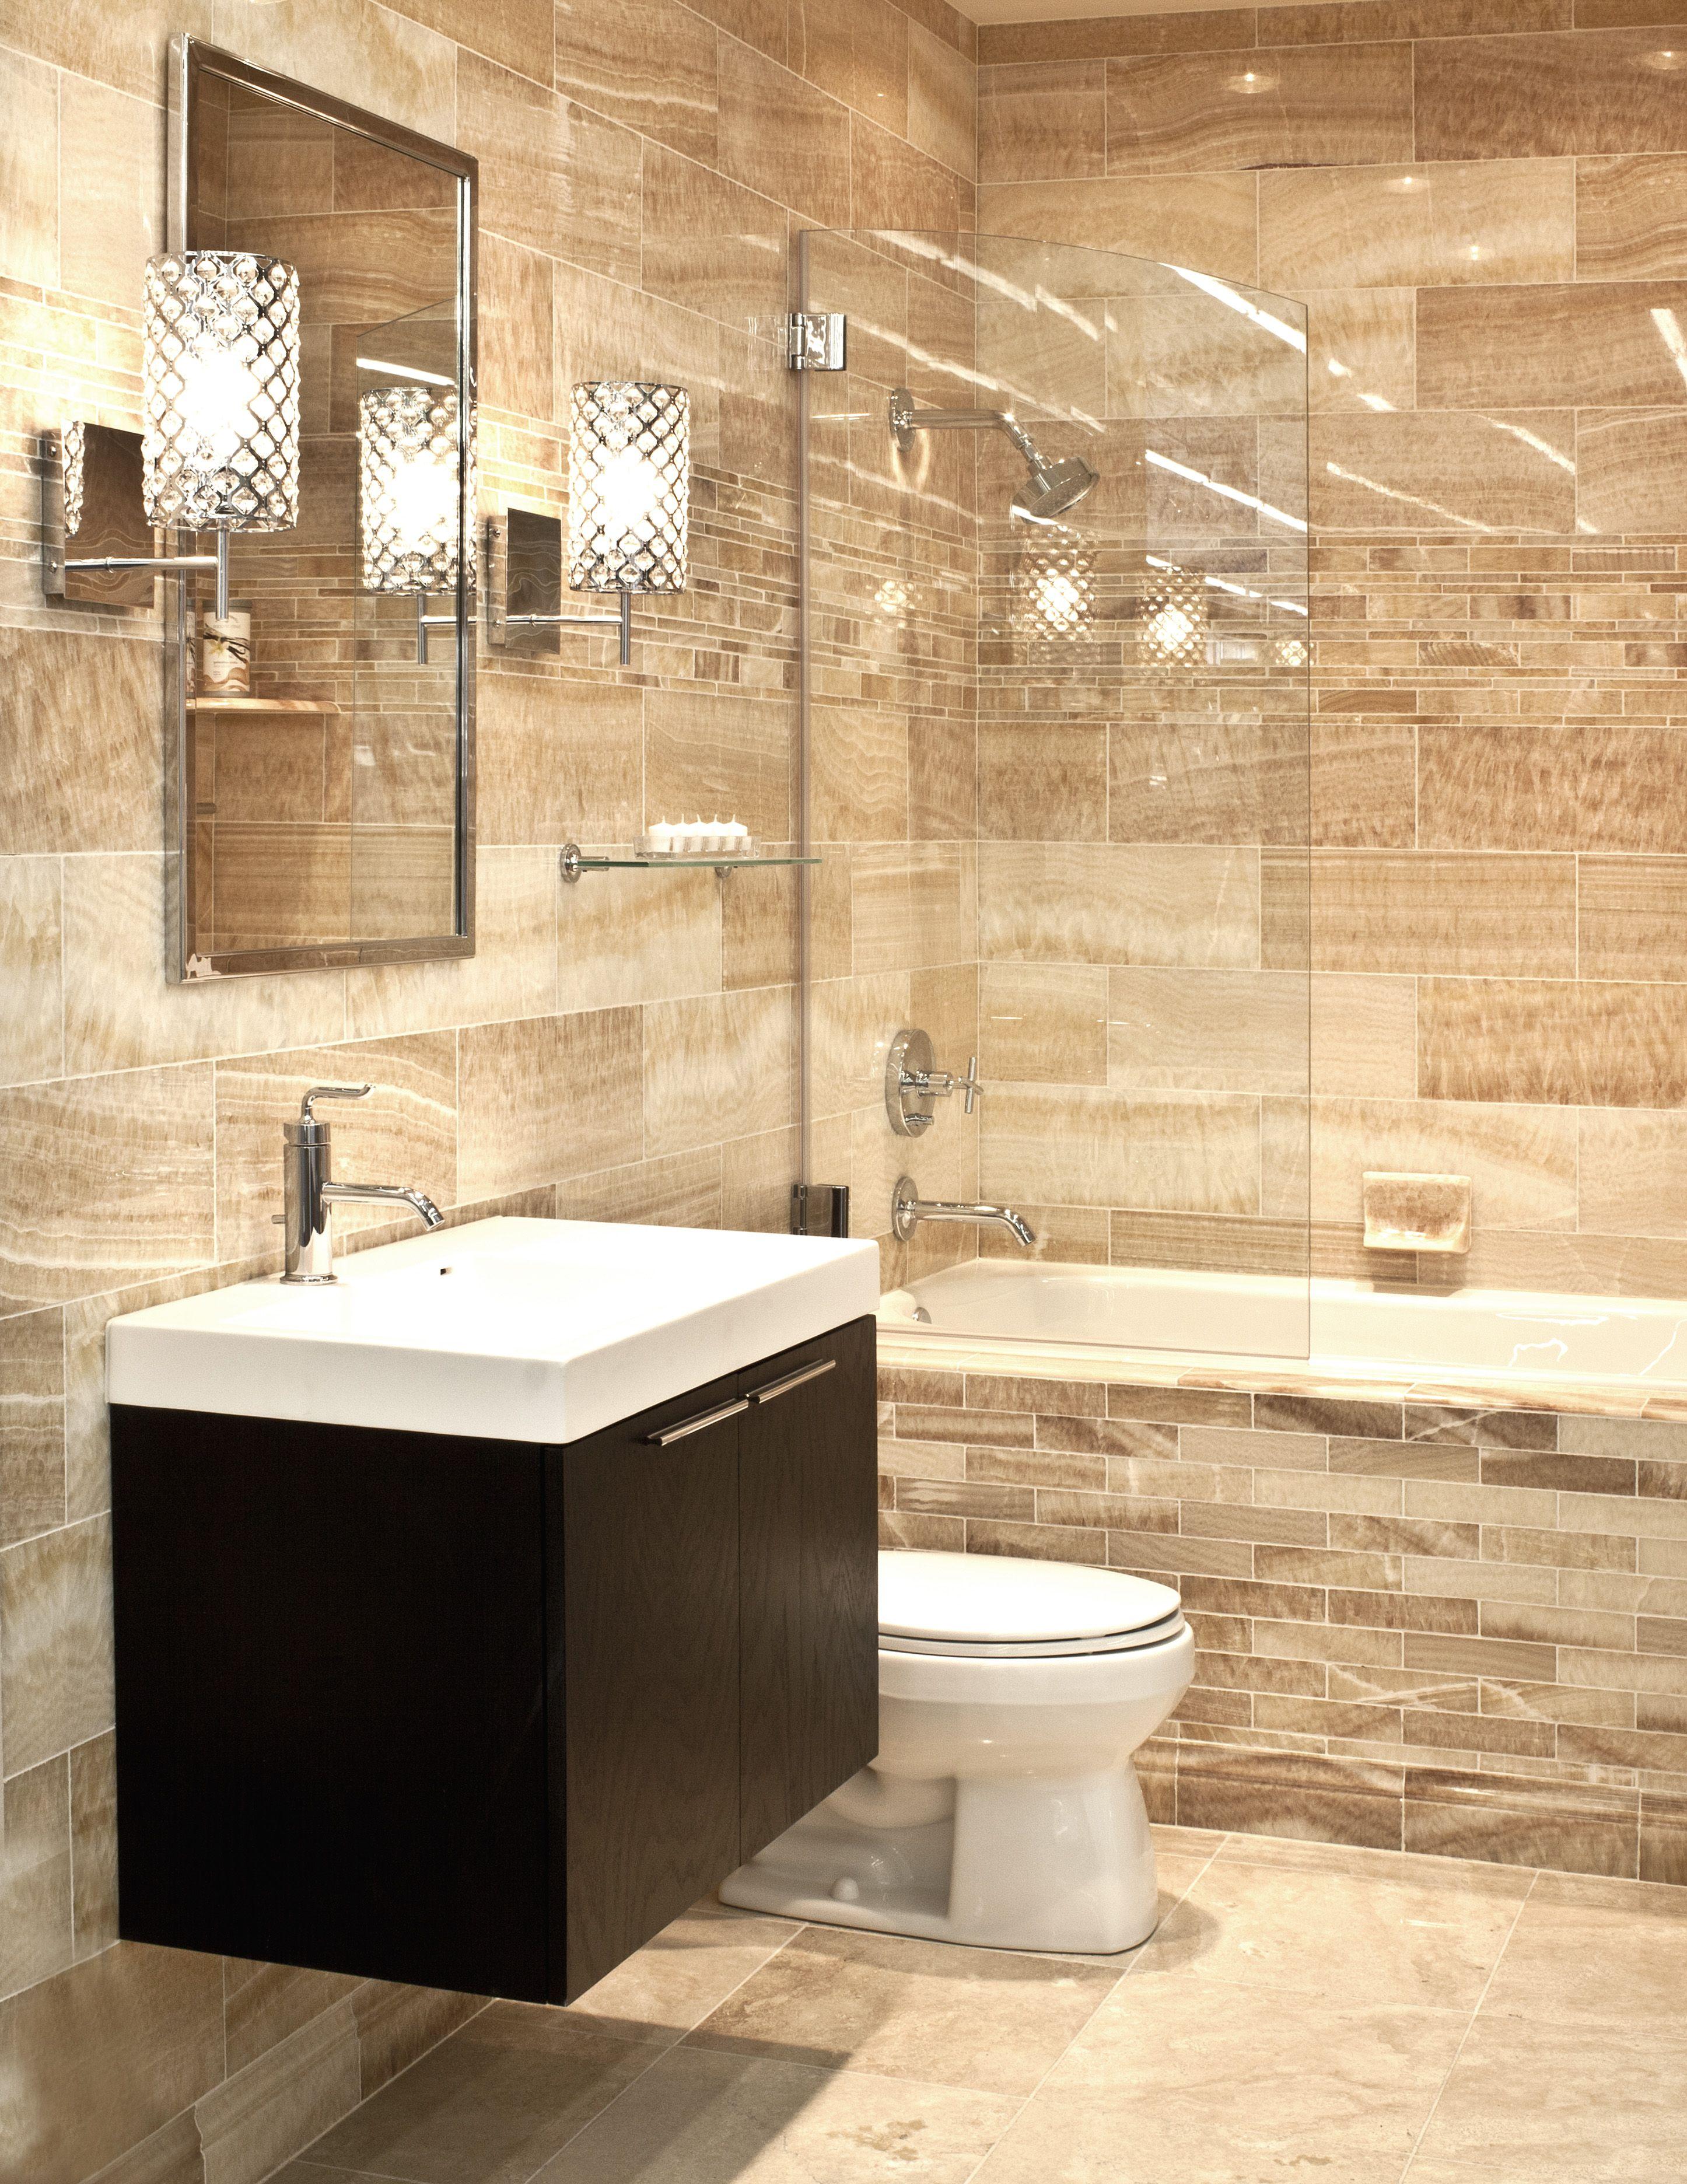 Luxurious Onyx Bathroom Bathroom remodeling Pinterest